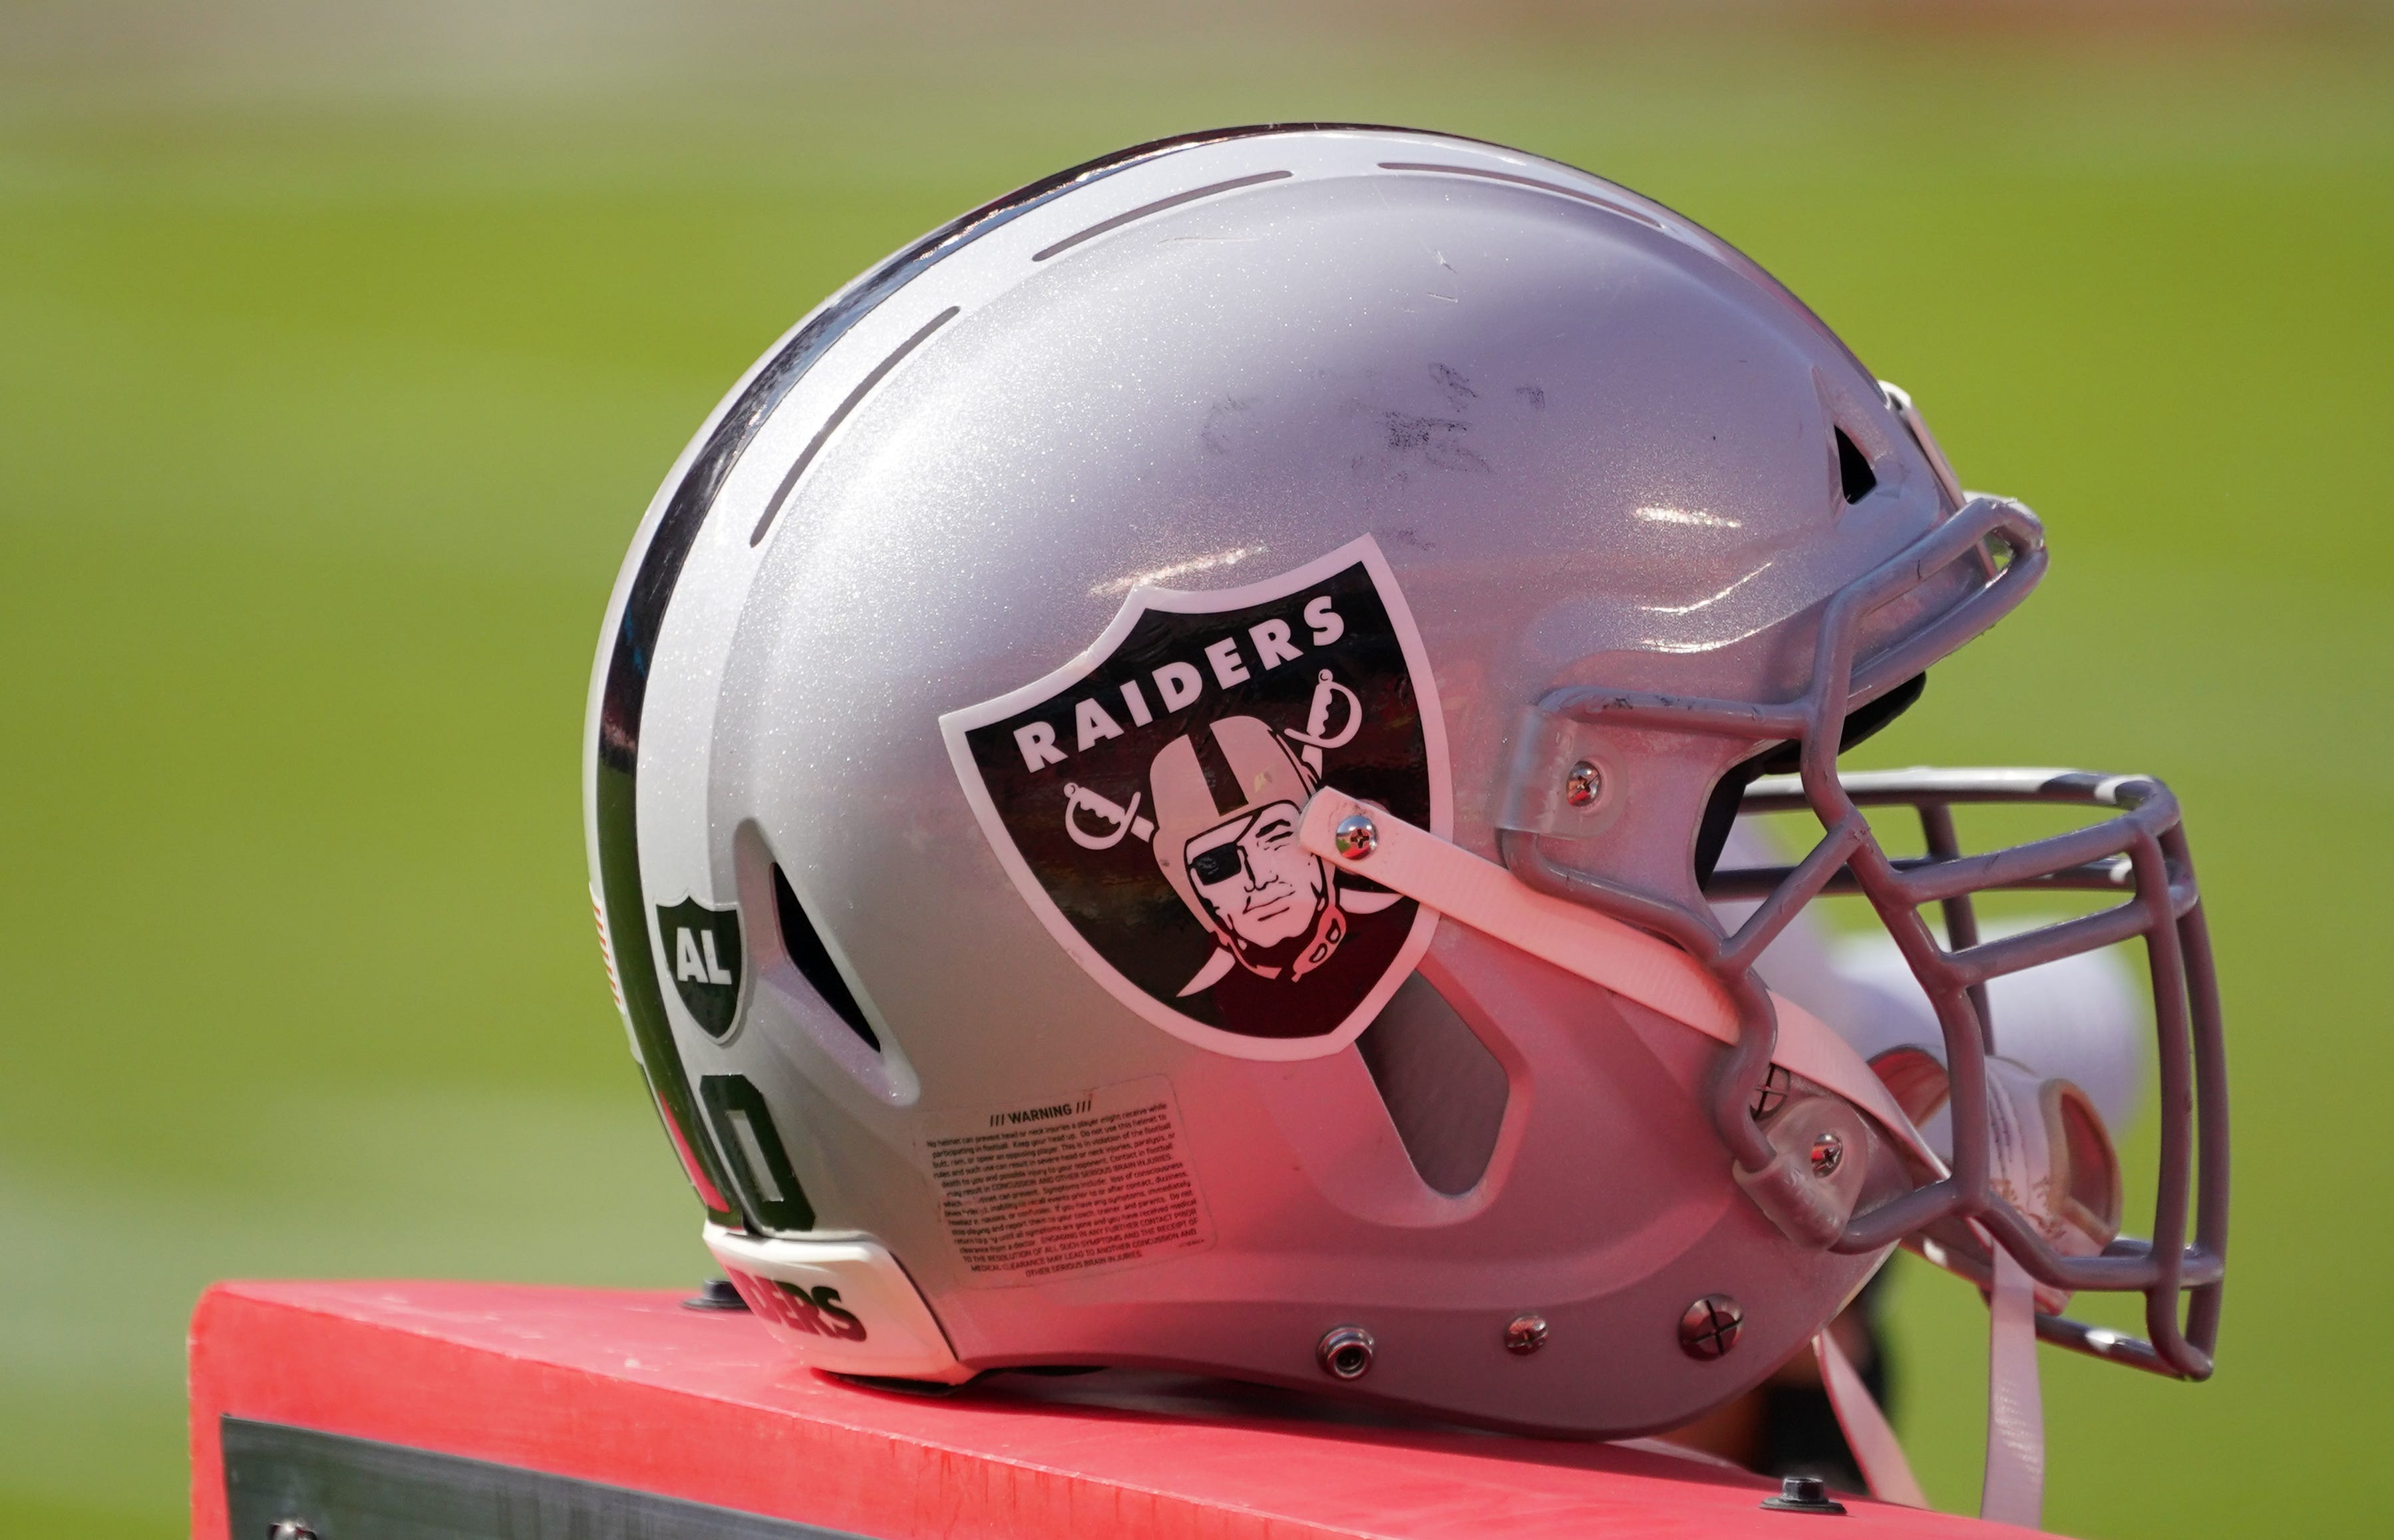 Raiders report no additional positive coronavirus tests on Friday, per reports